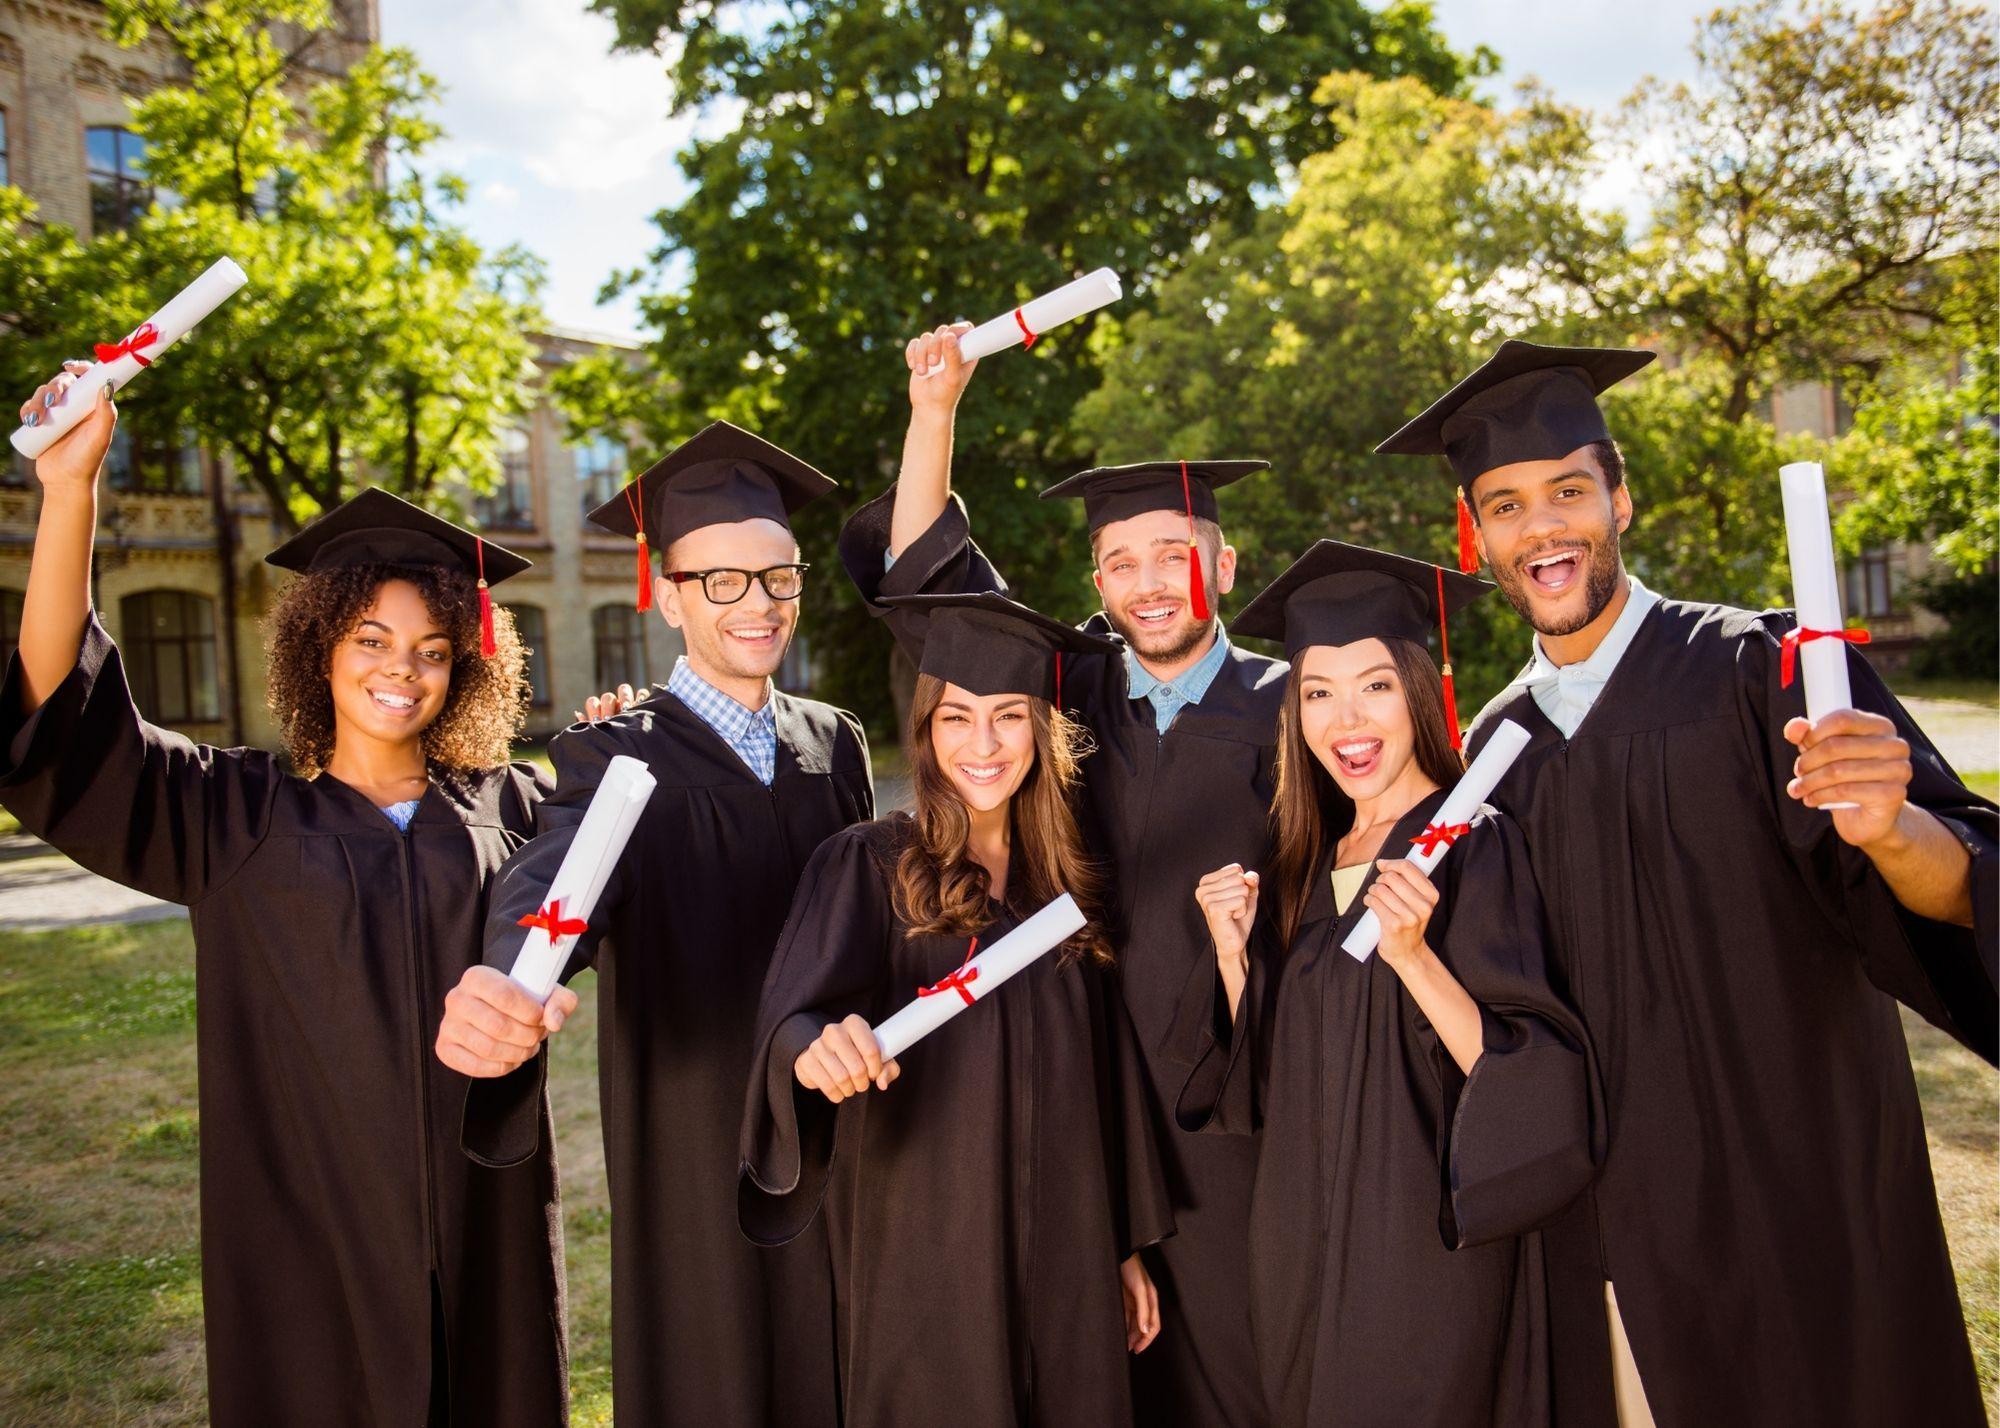 education, graduation and people